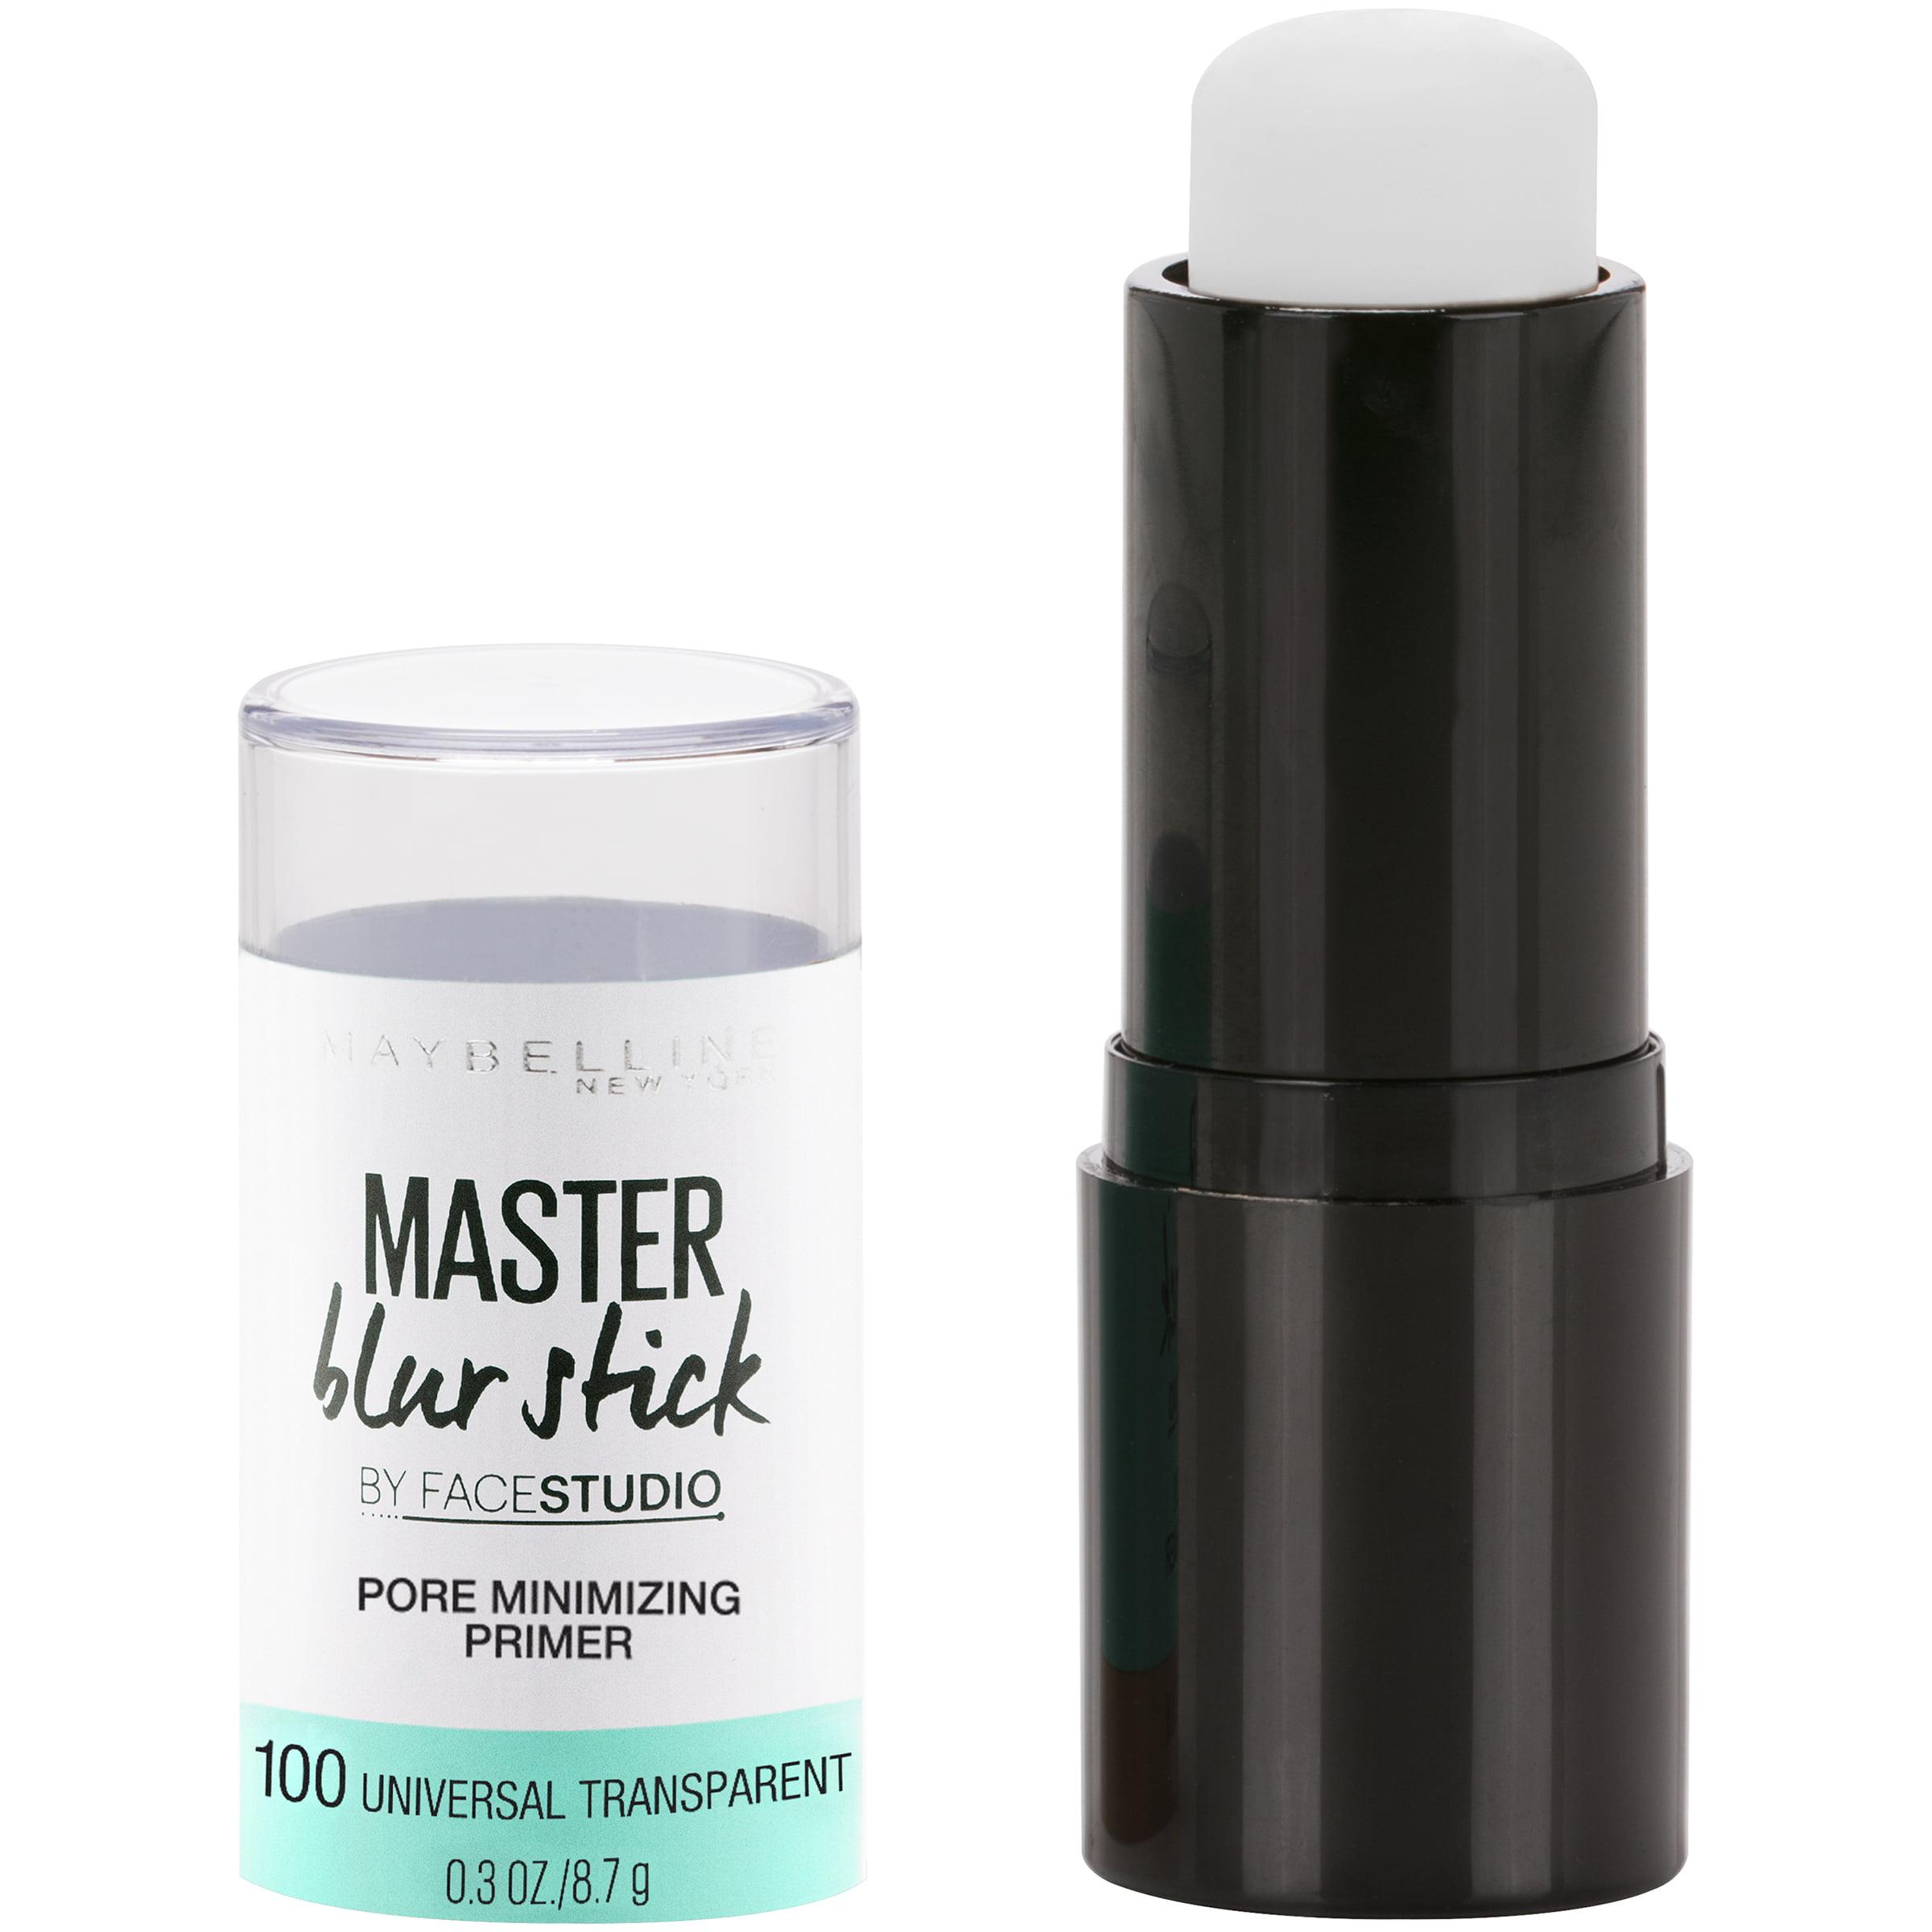 Maybelline Facestudio Master Blur Stick Primer, Universal Transparent